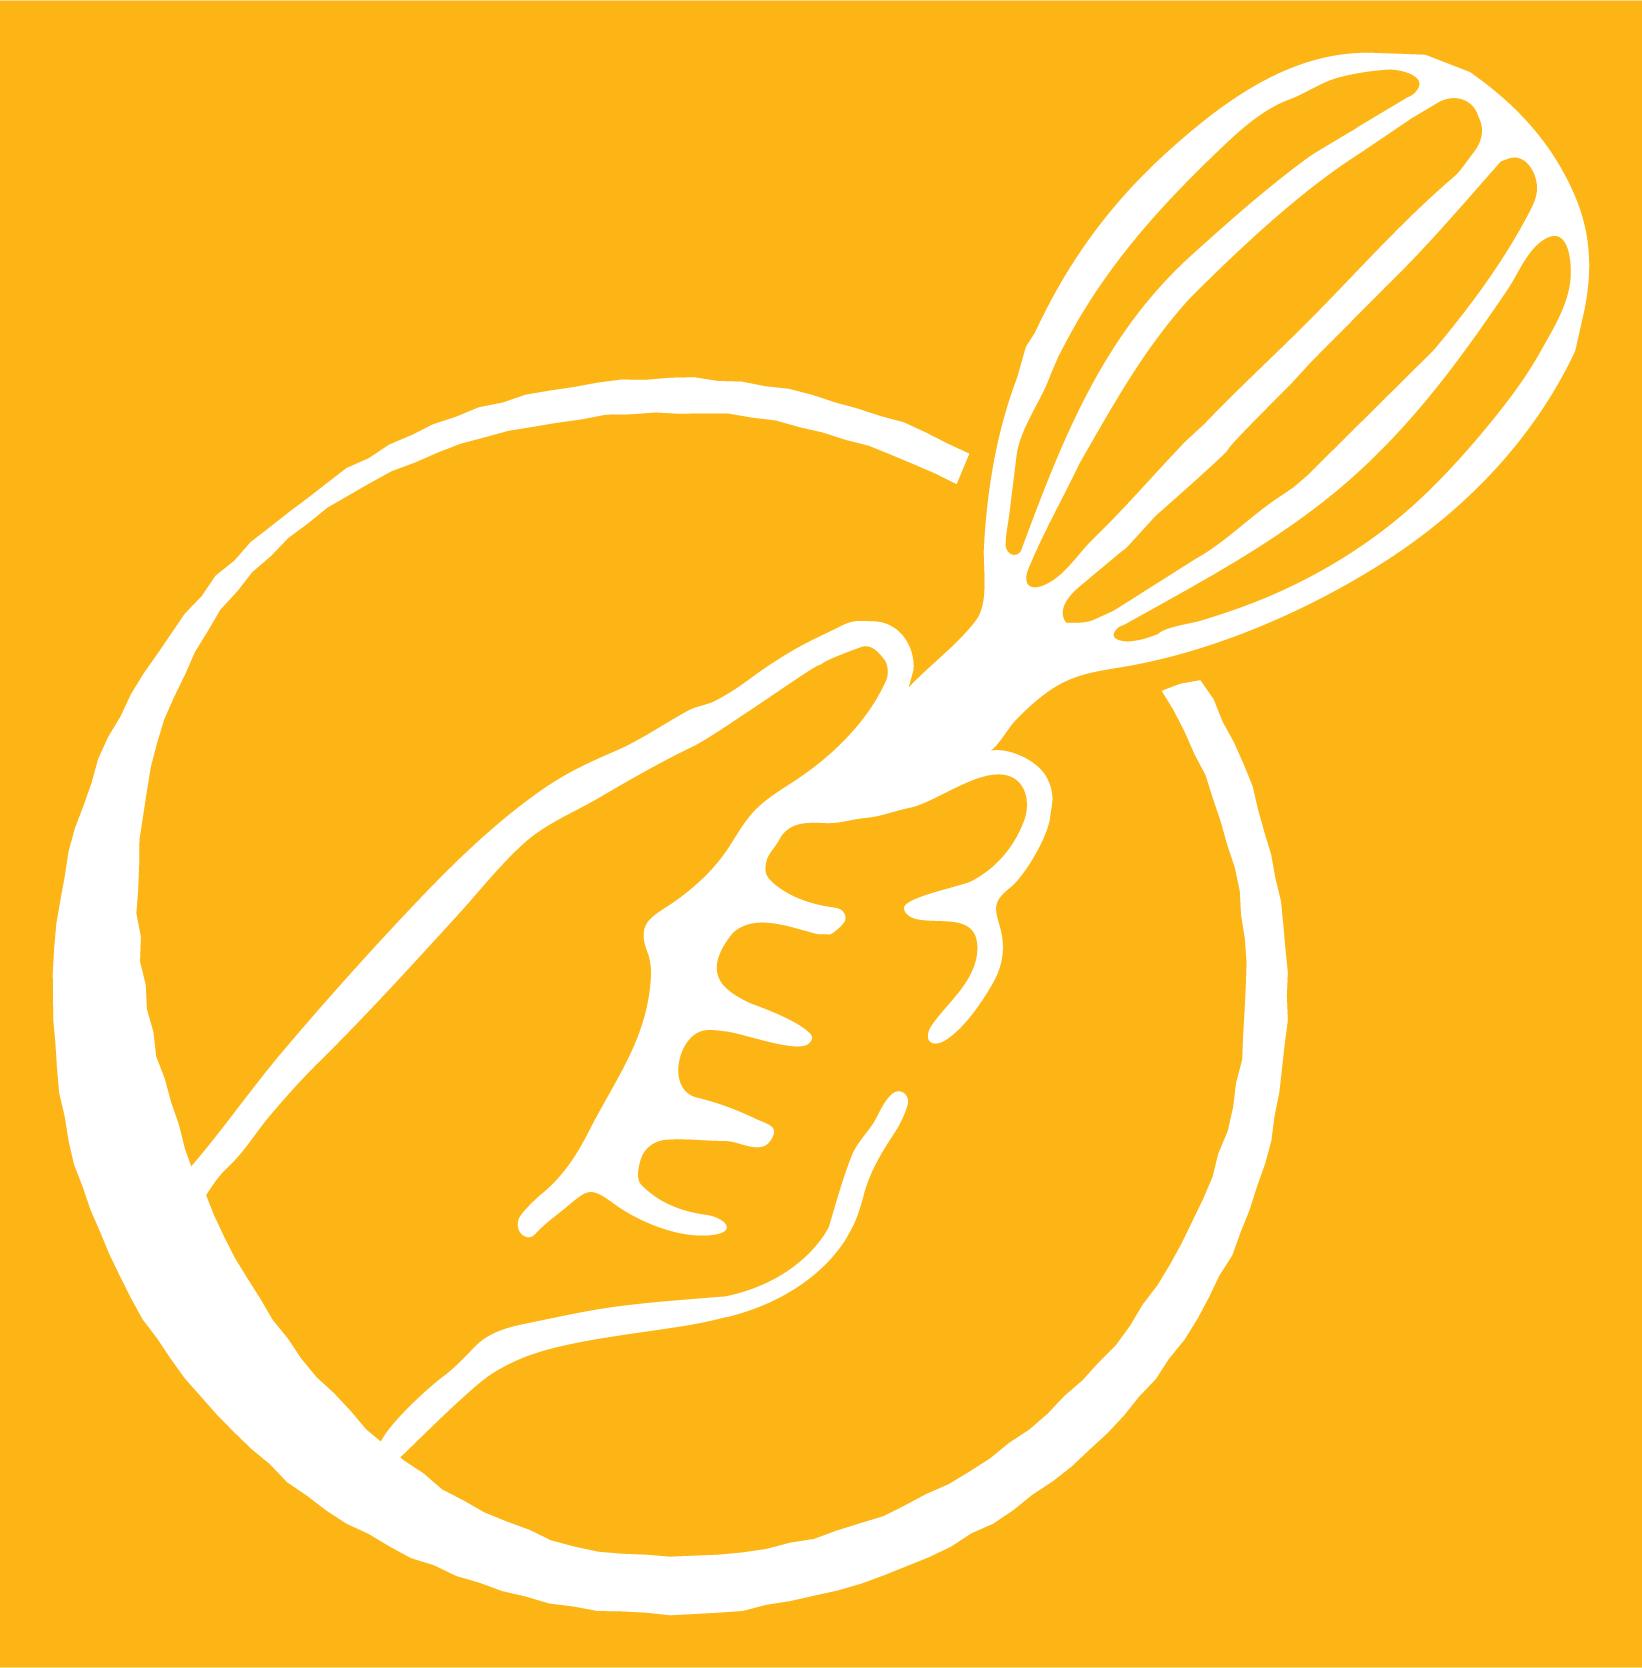 icone_logo.png